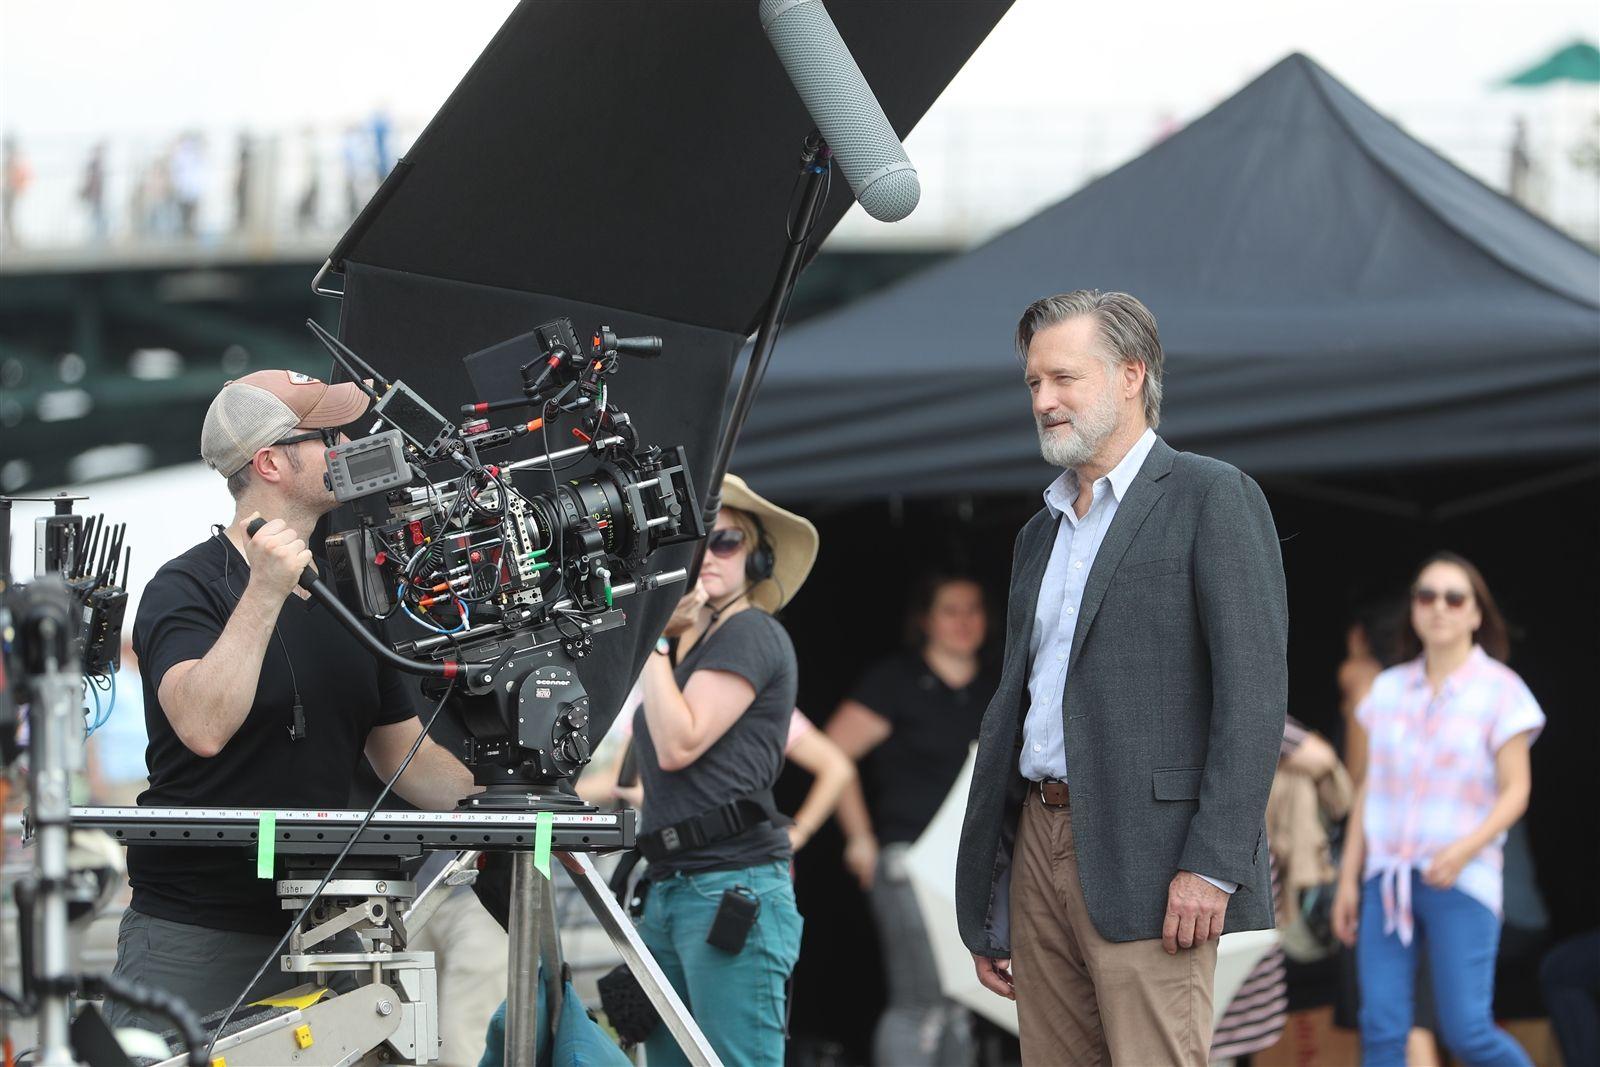 Bill Pullman and crew on set.